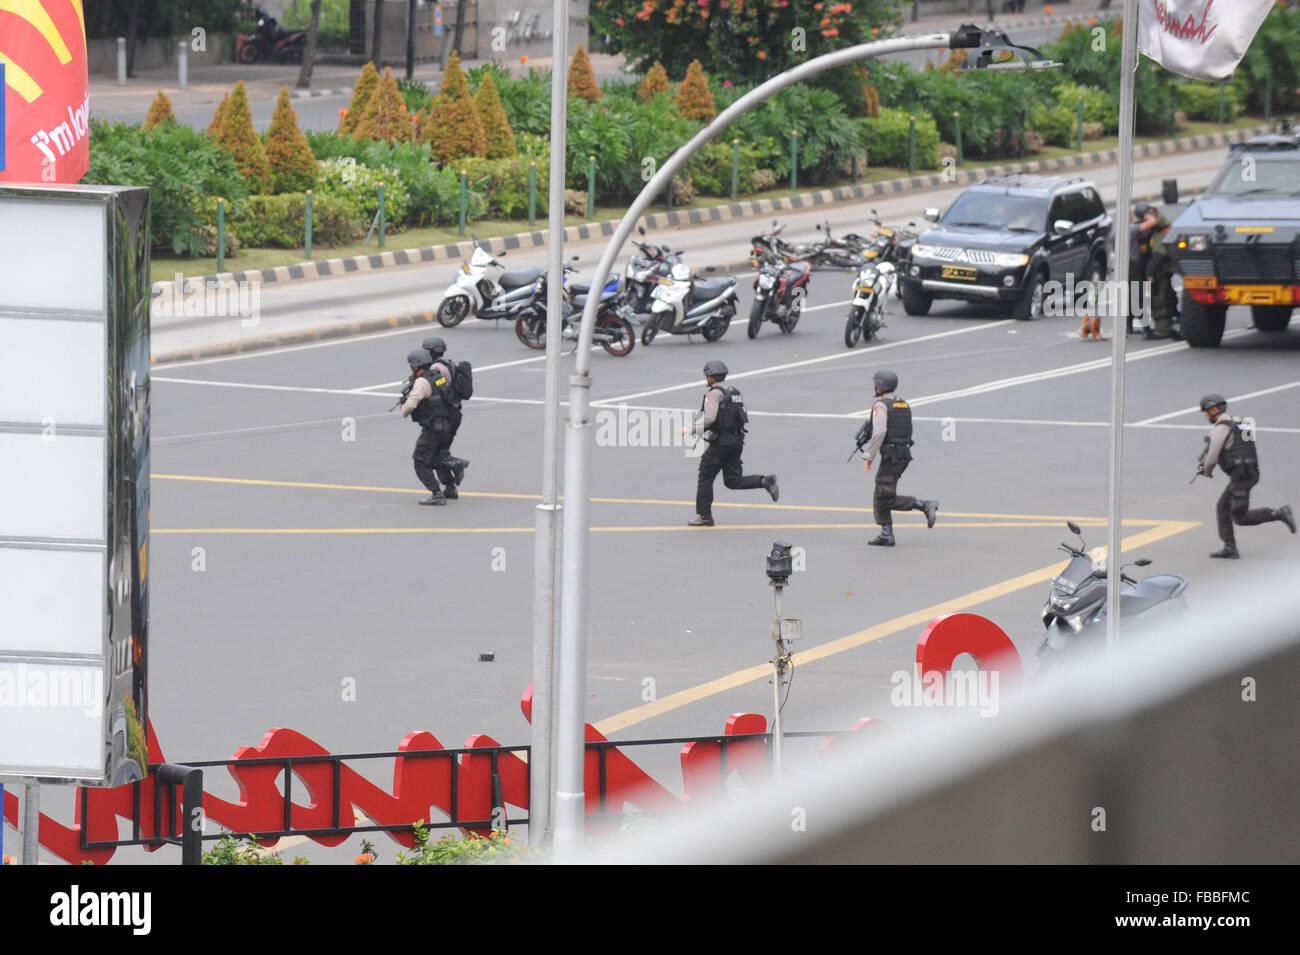 Jakarta, Indonesia. 14th Jan, 2016. Armed police officers run on a street in Jakarta, Indonesia, Jan. 14, 2016. Stock Photo